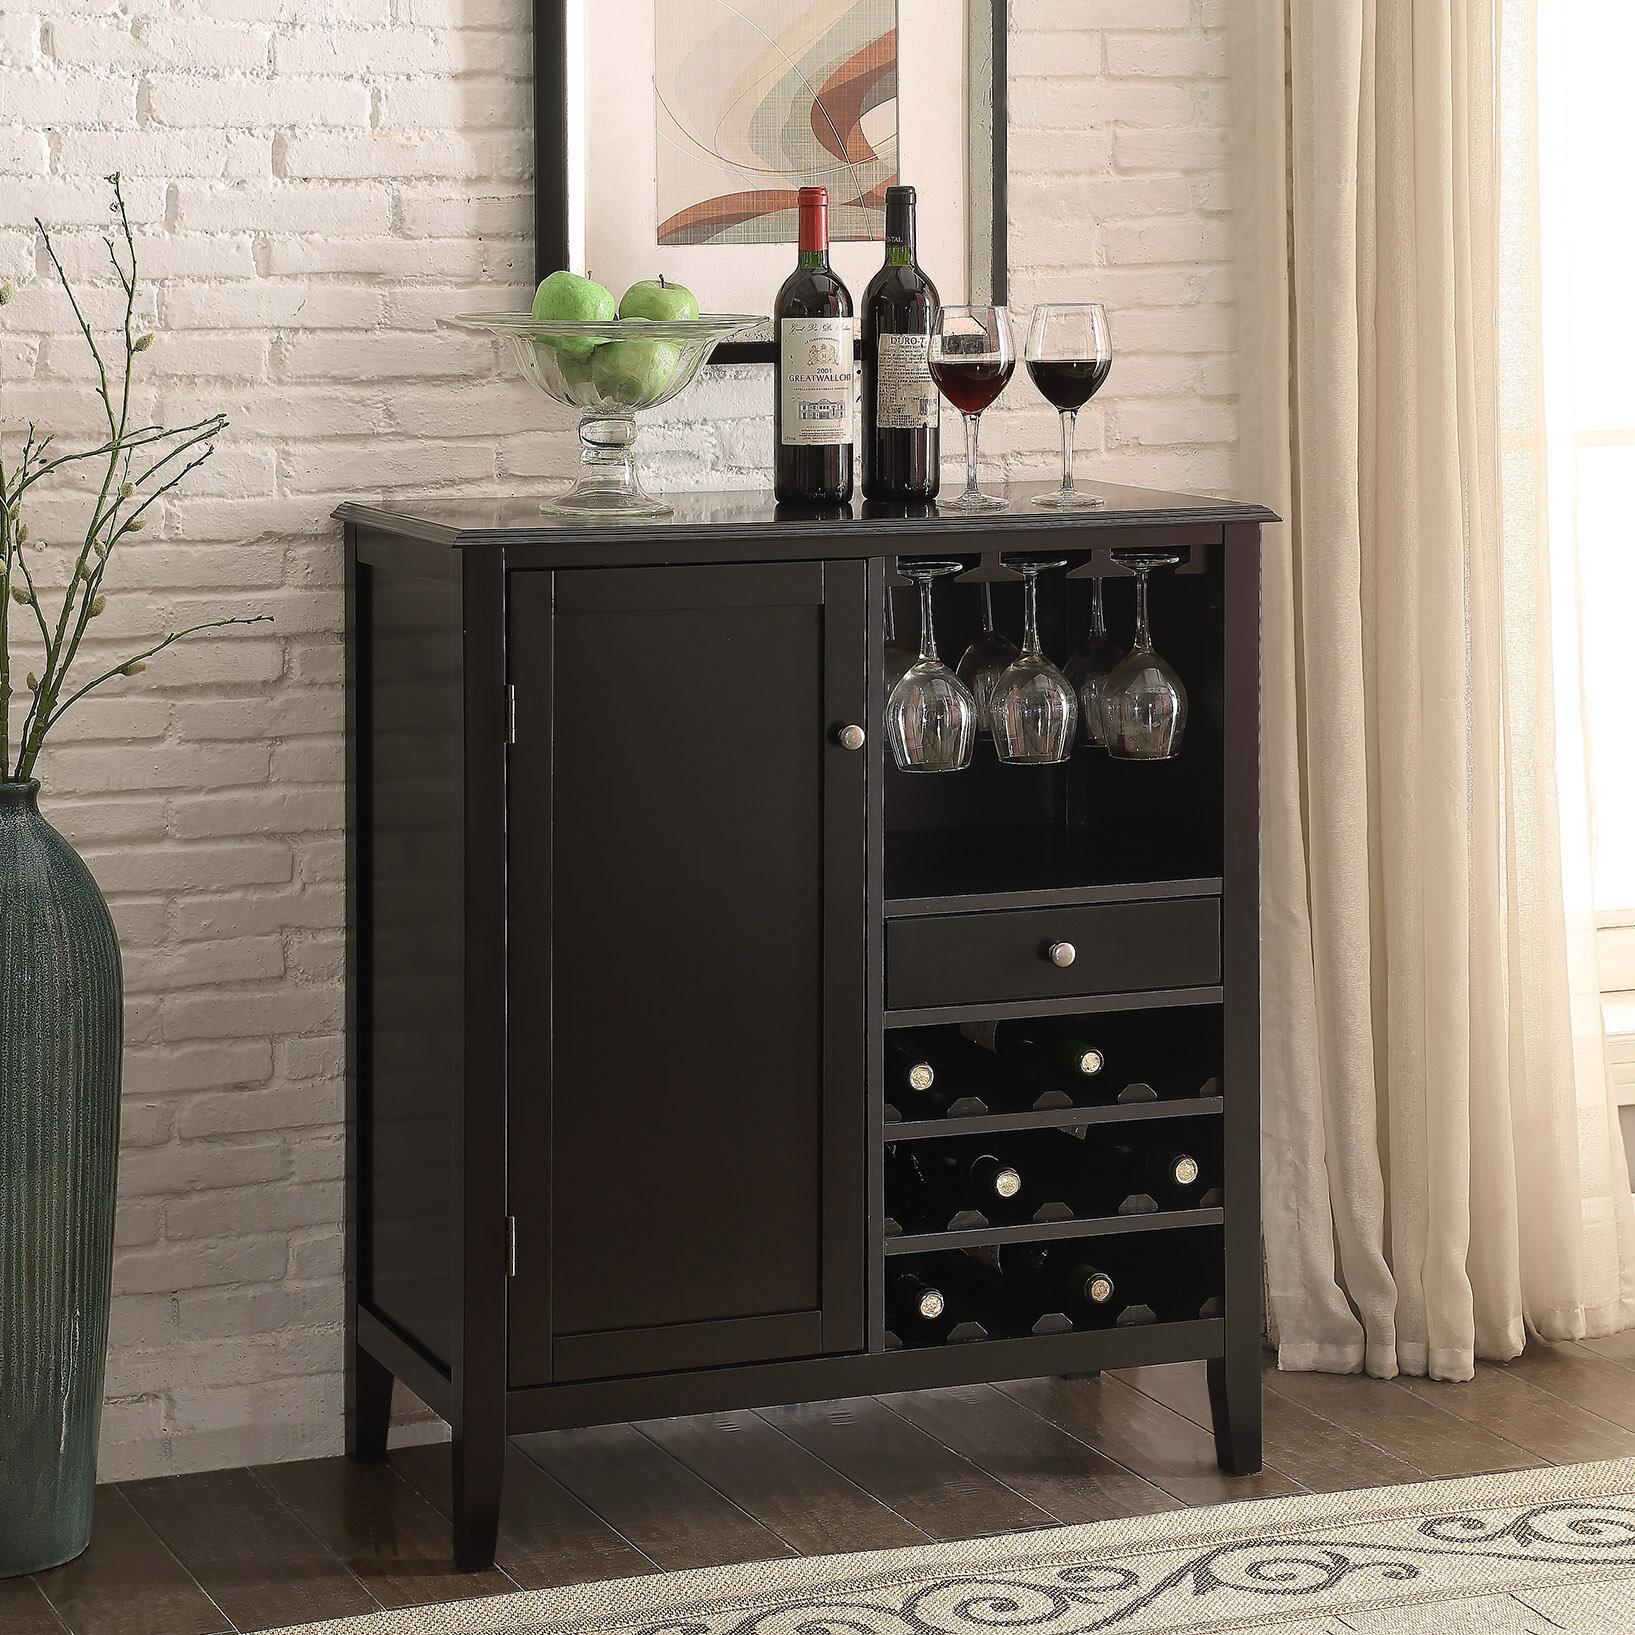 Image result for wine storage